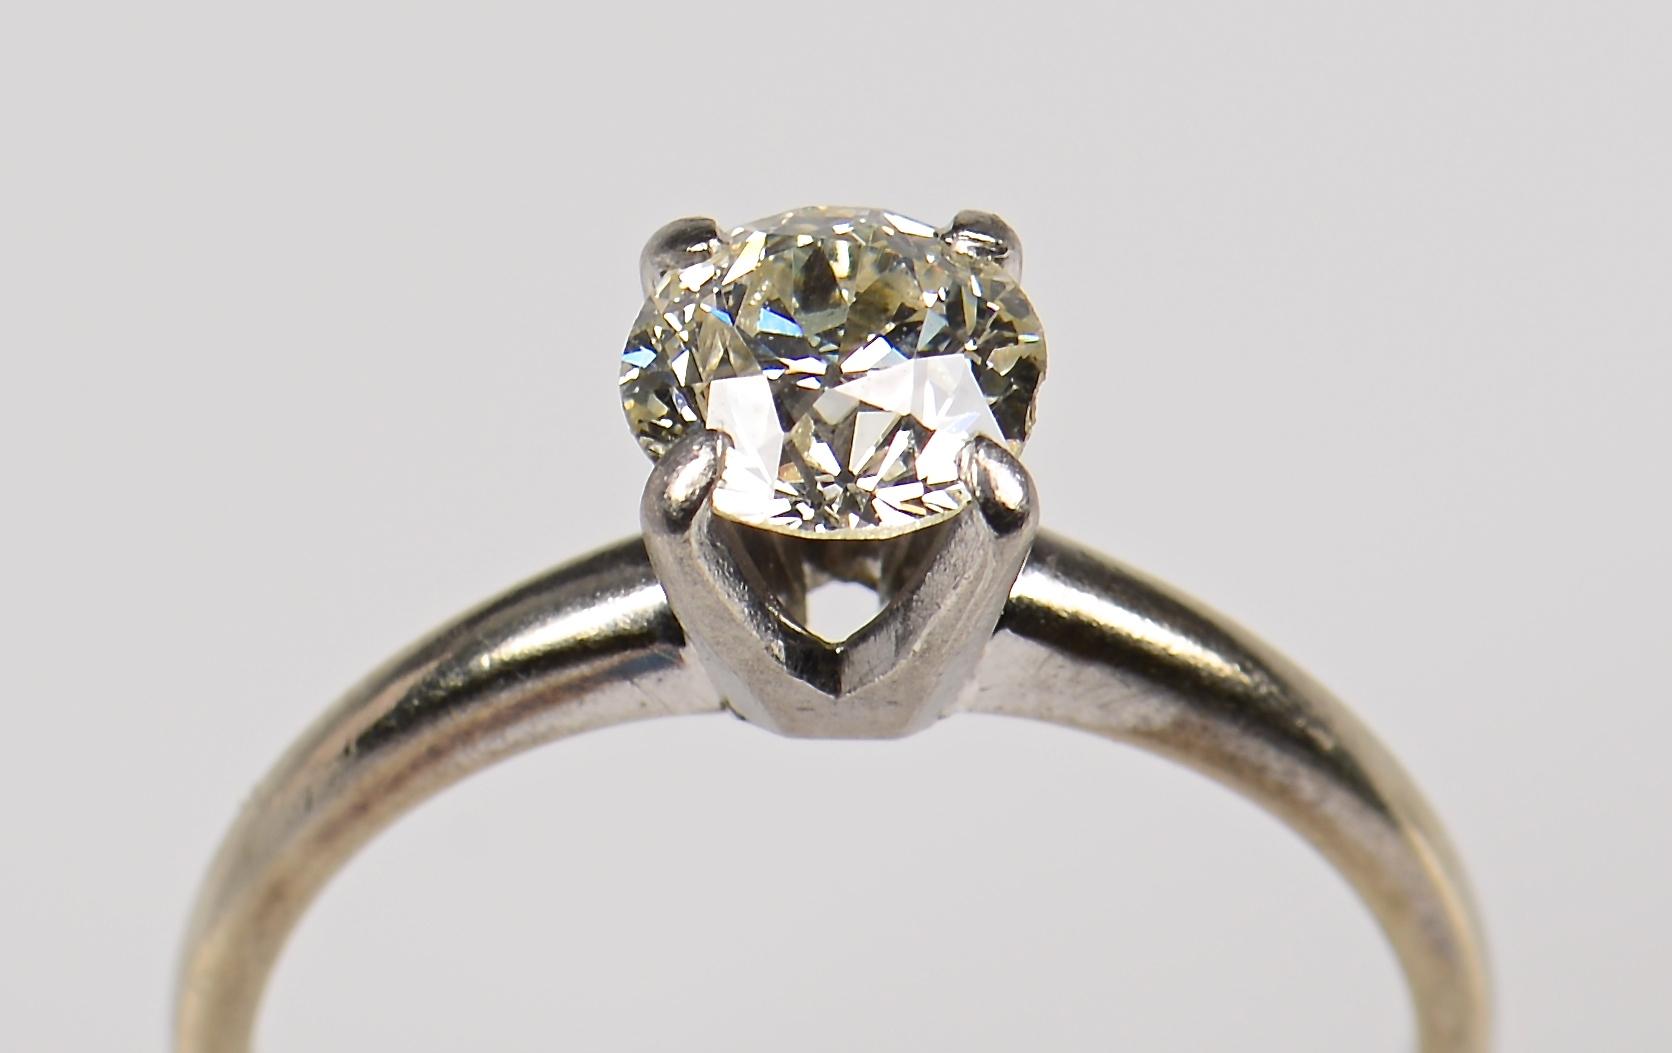 Lot 368: 2 14K OMC Diamond Solitaire Rings